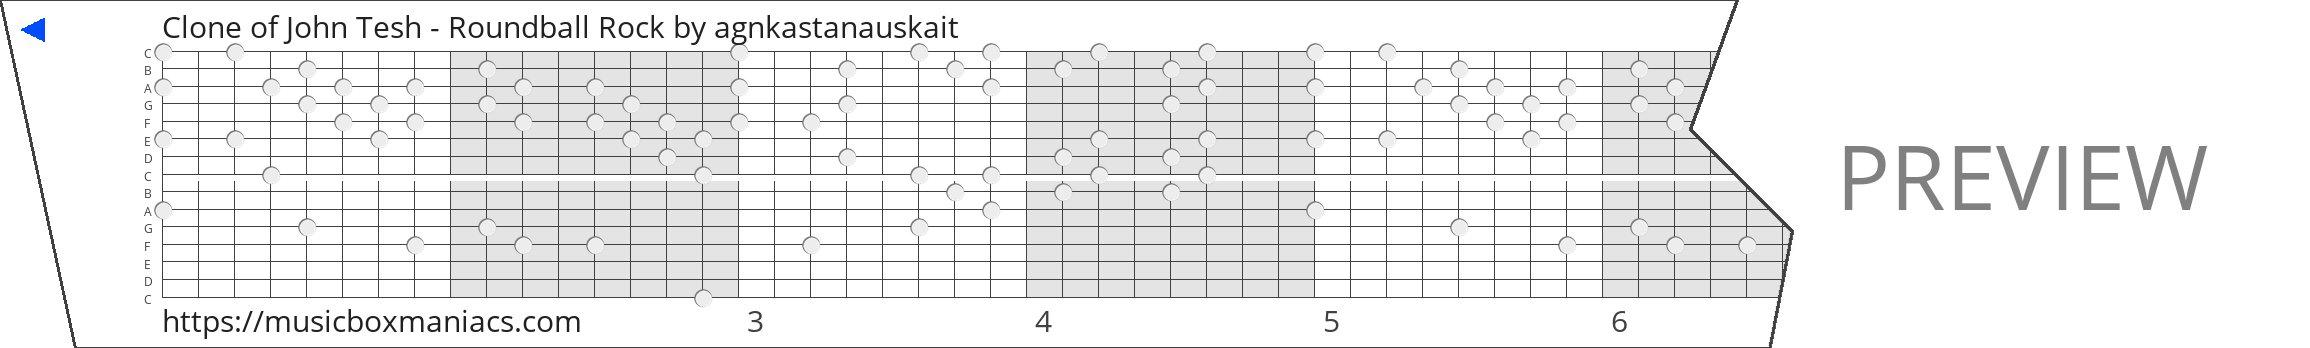 Clone of John Tesh - Roundball Rock 15 note music box paper strip